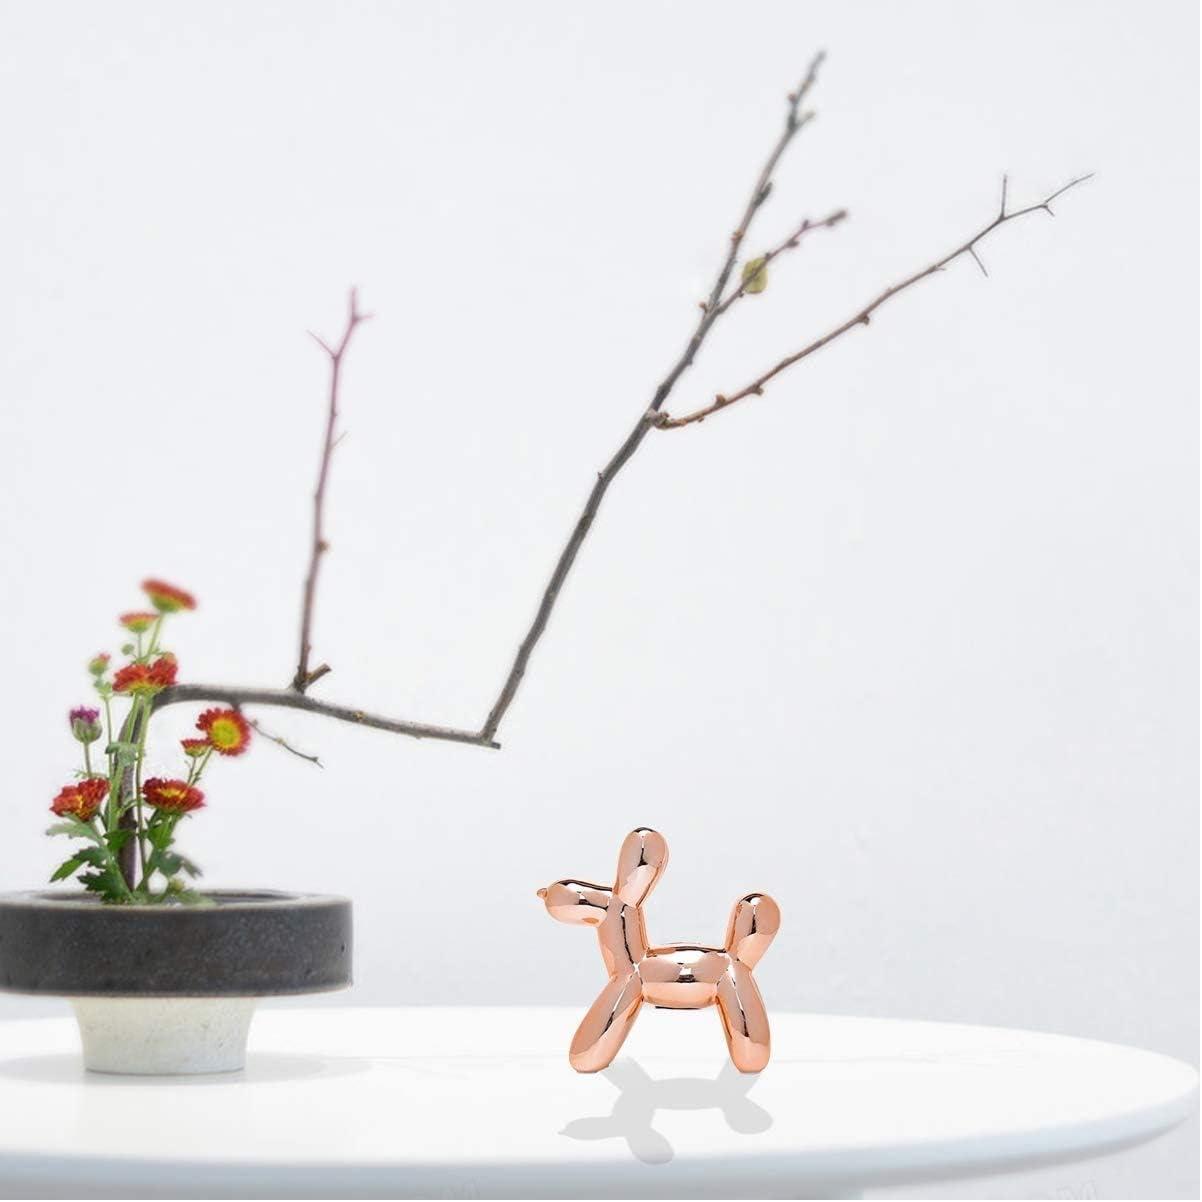 Balloon Dogs Sculpture - Ceramic Animal Figurine - Art Statue - Desktop Dog Decor - Small-Rose-Gold